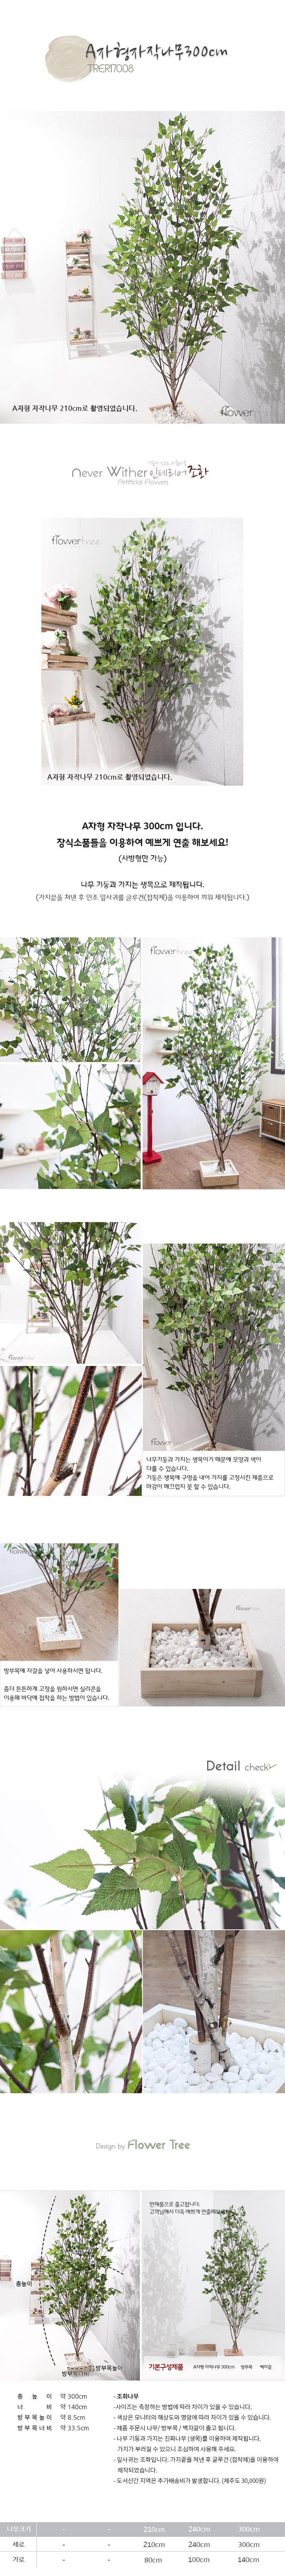 A자형자작나무 300cm FREOFT - 플라워트리, 318,000원, 조화, 카네이션(조화)